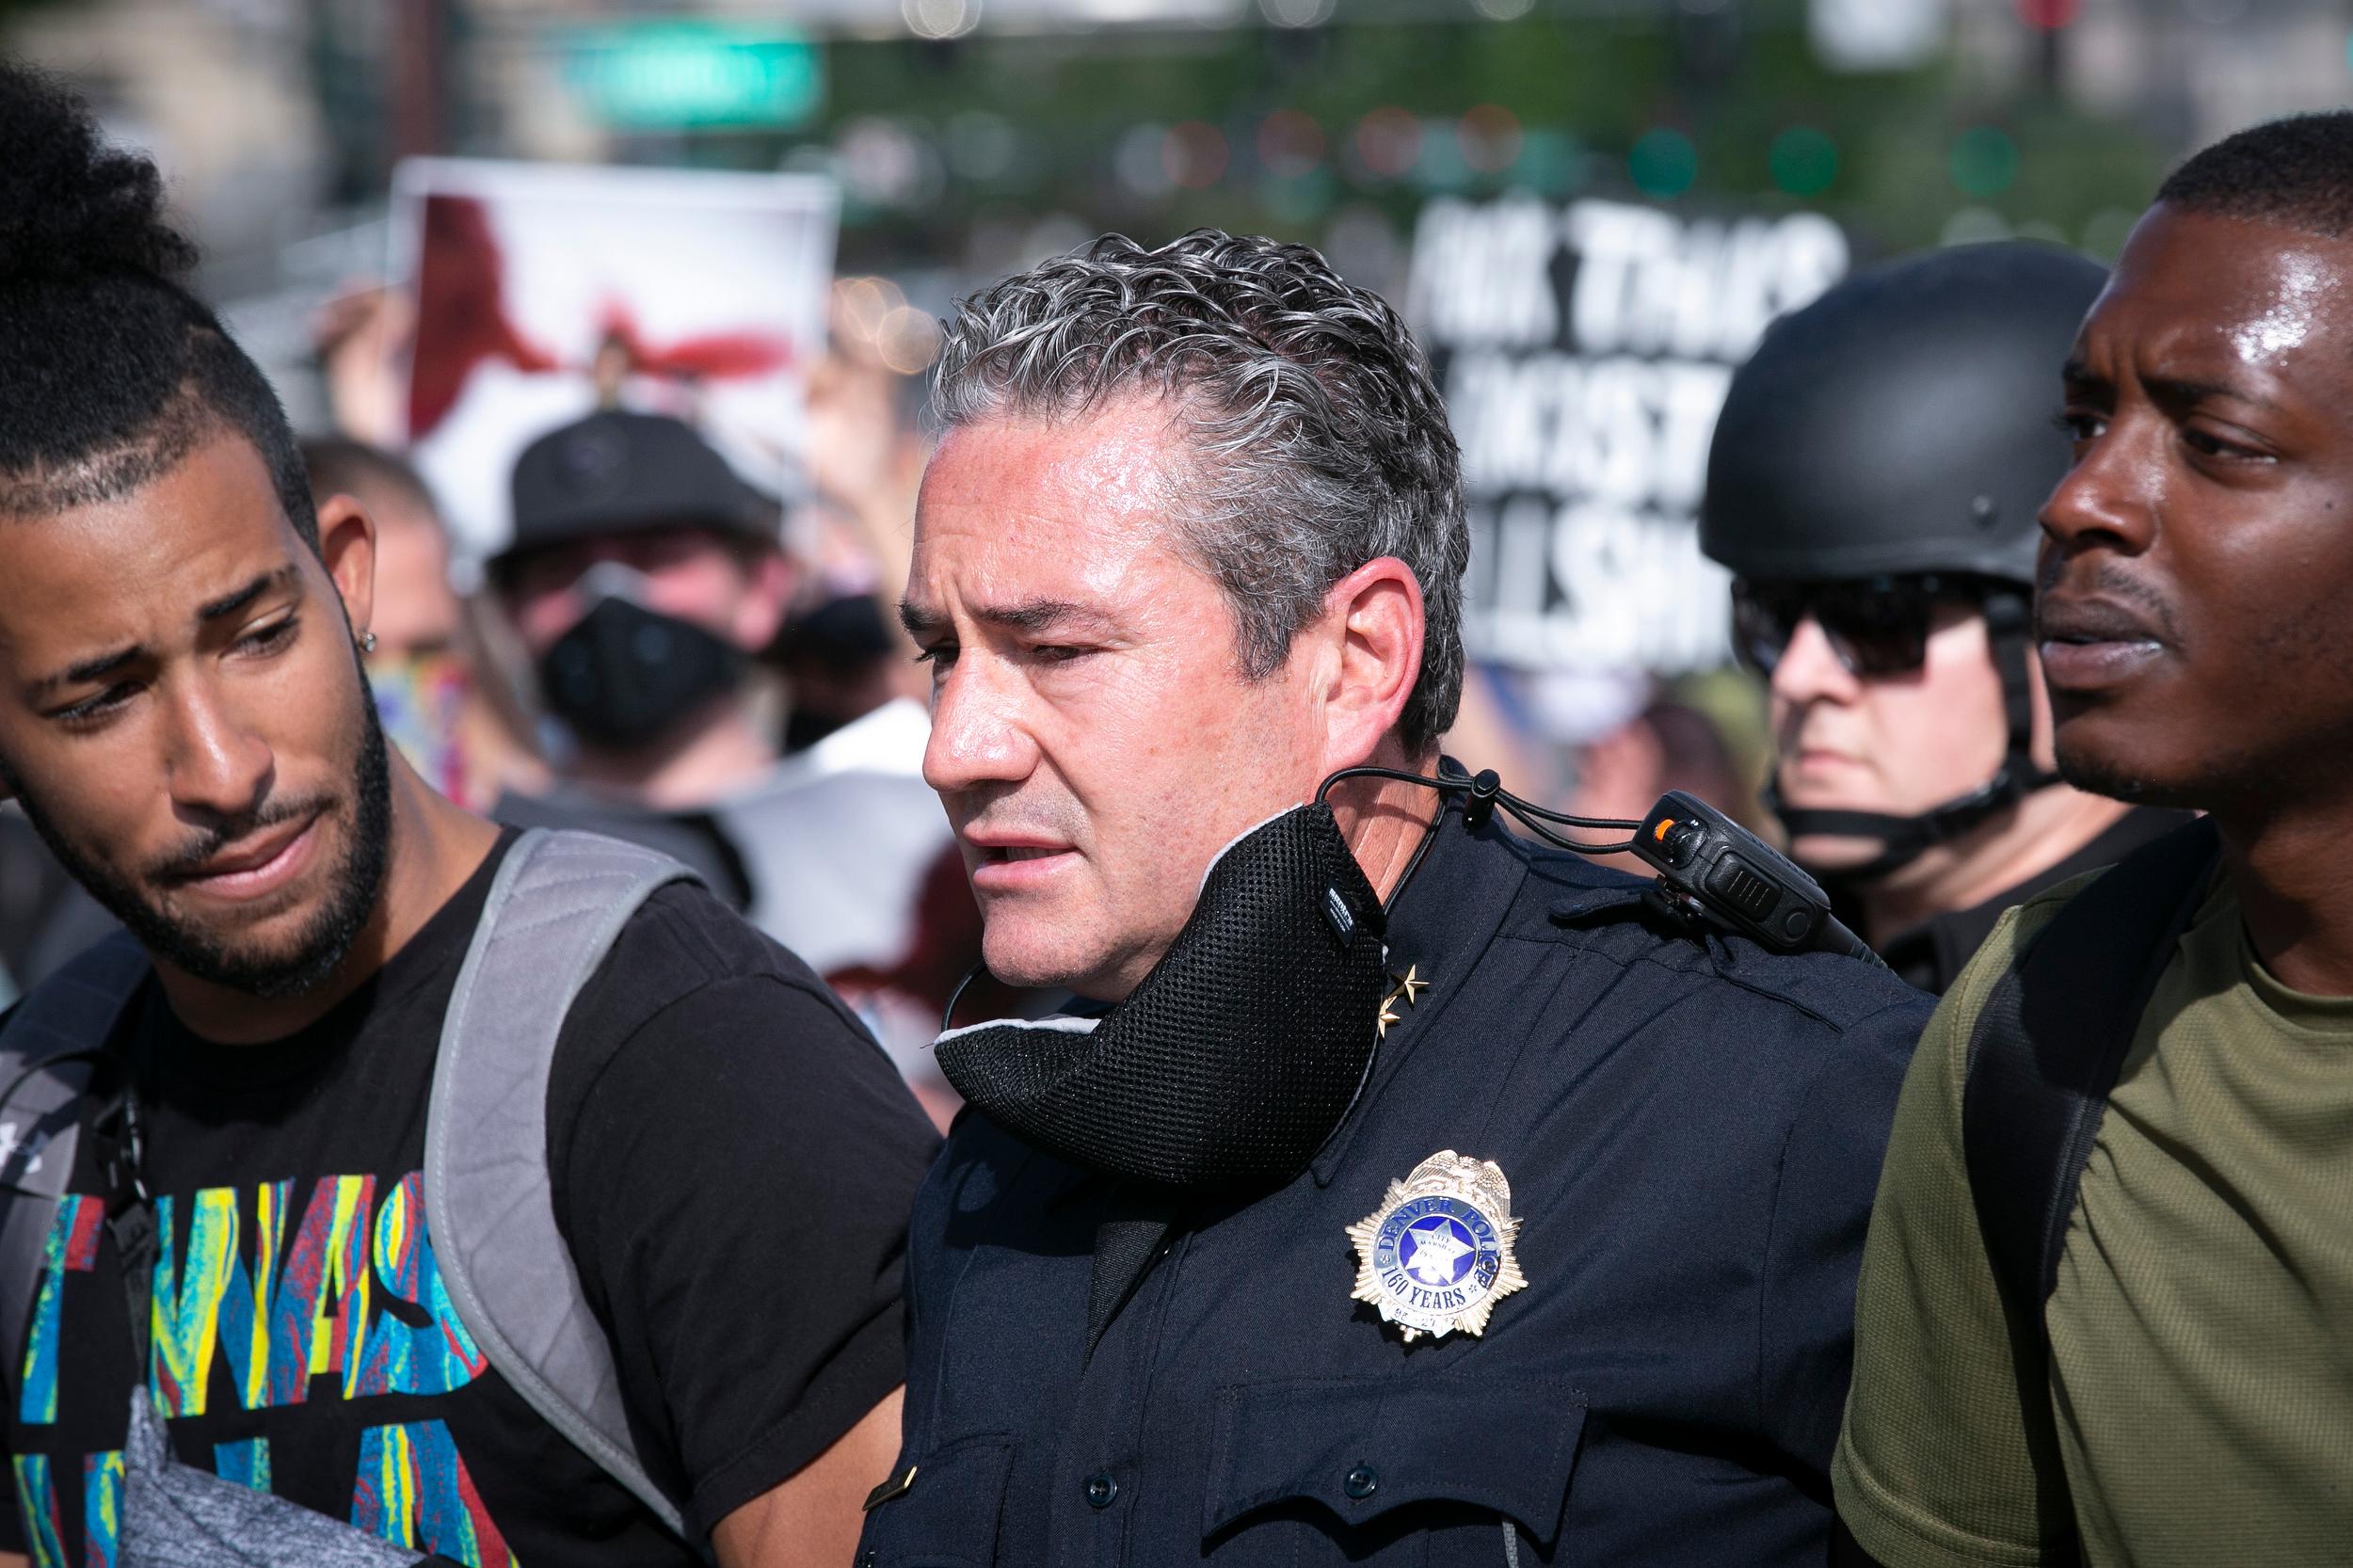 Denver Police Chief Pazen Joins Demonstartors Protesting George Floyd's Death In Minneapolis